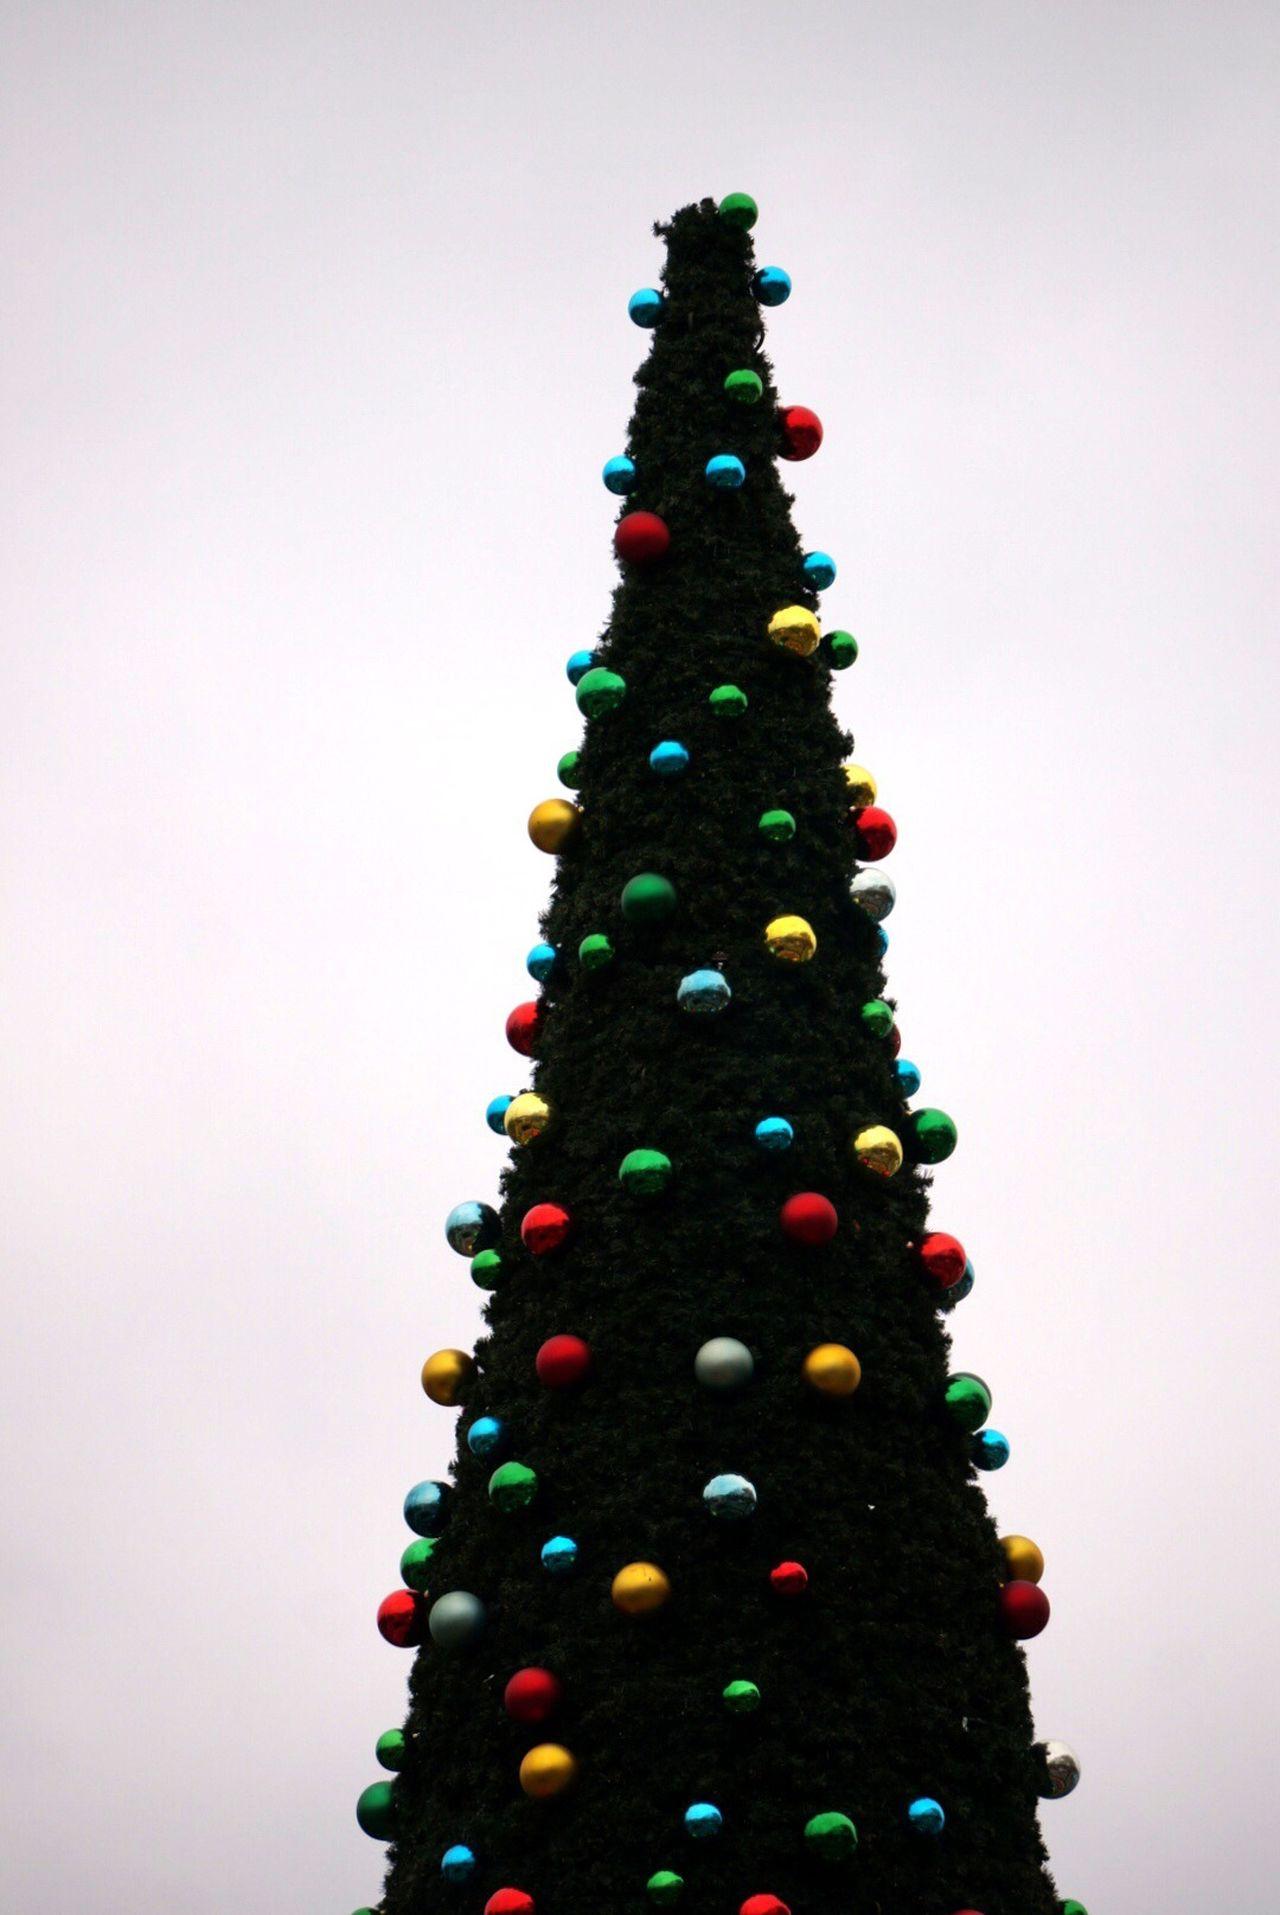 Christmas Tree Festive Season Christmas Christmastree Merry Christmas! Tivoli Trees TreePorn Hugging A Tree Christmas Decorations How You Celebrate Holidays Showcase: December